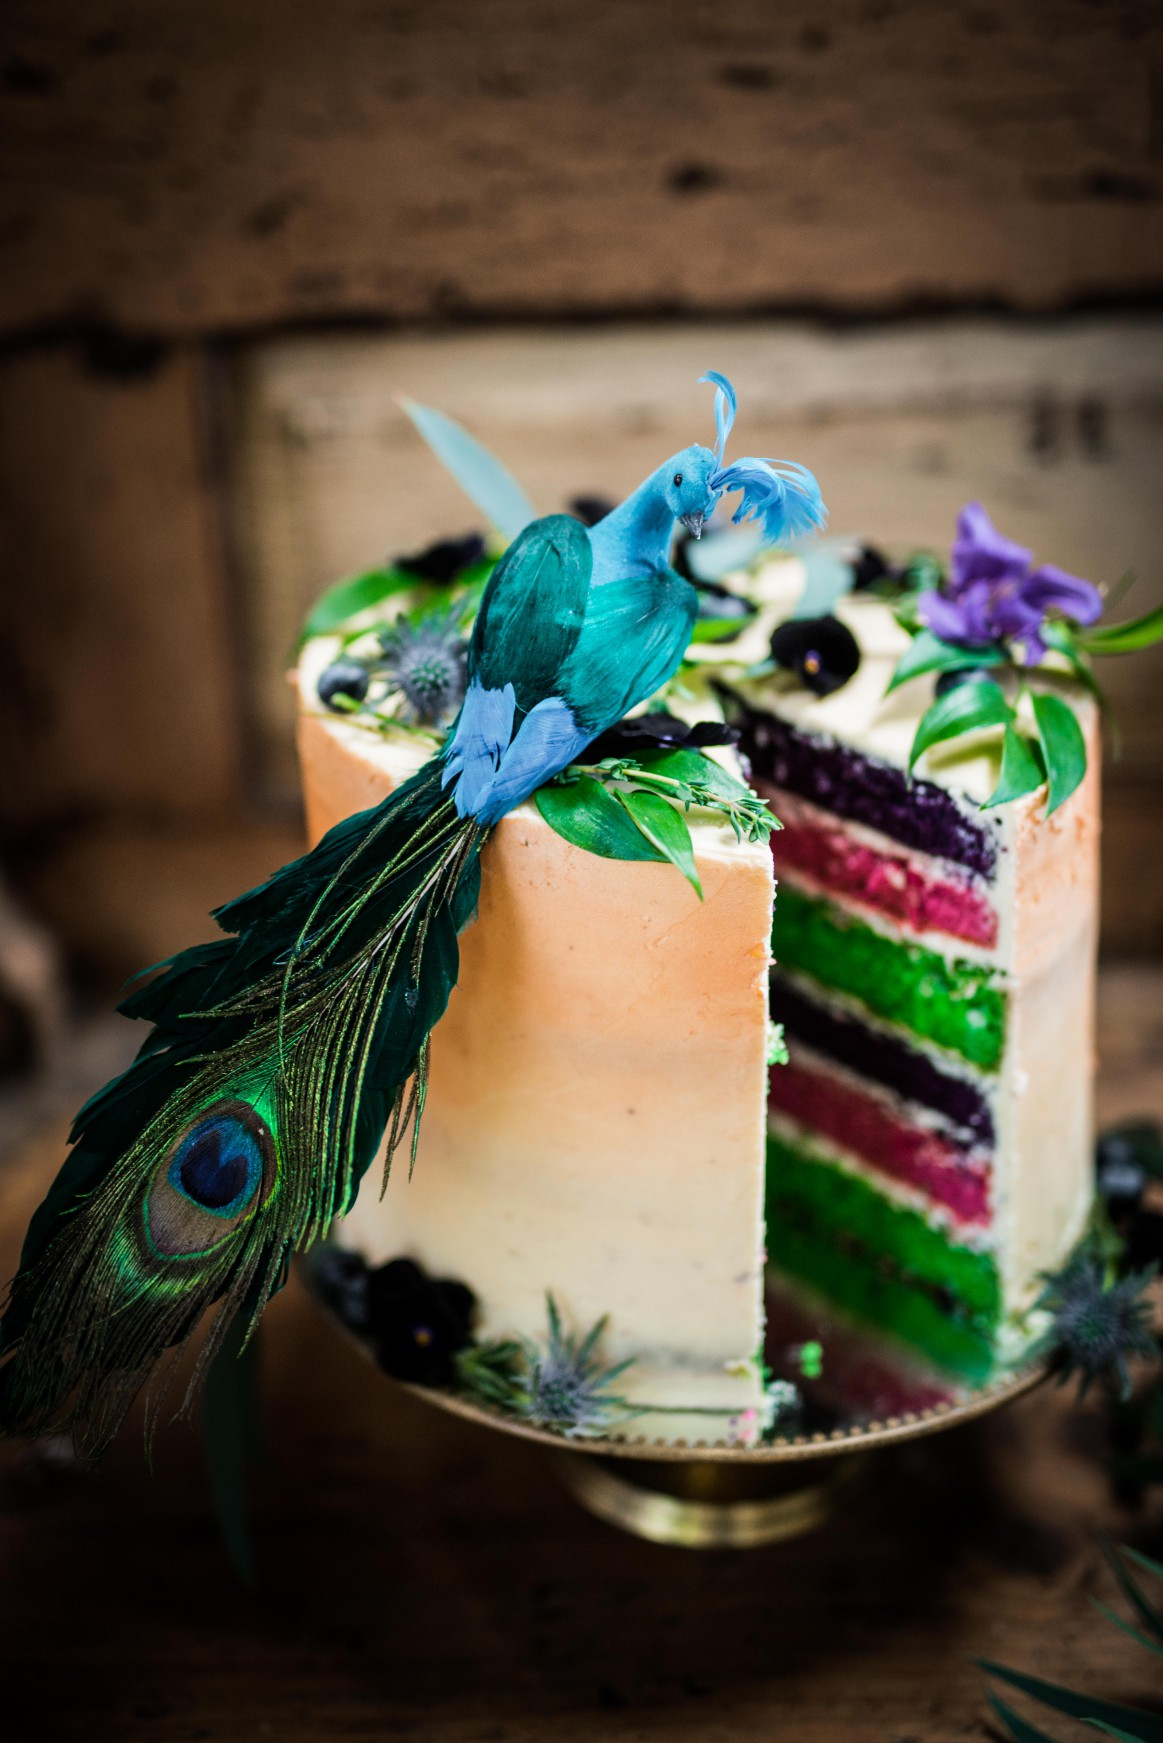 Peacock barns - alternative unconventional wedding photoshoot - rustic decadent - peacock rainbow cake